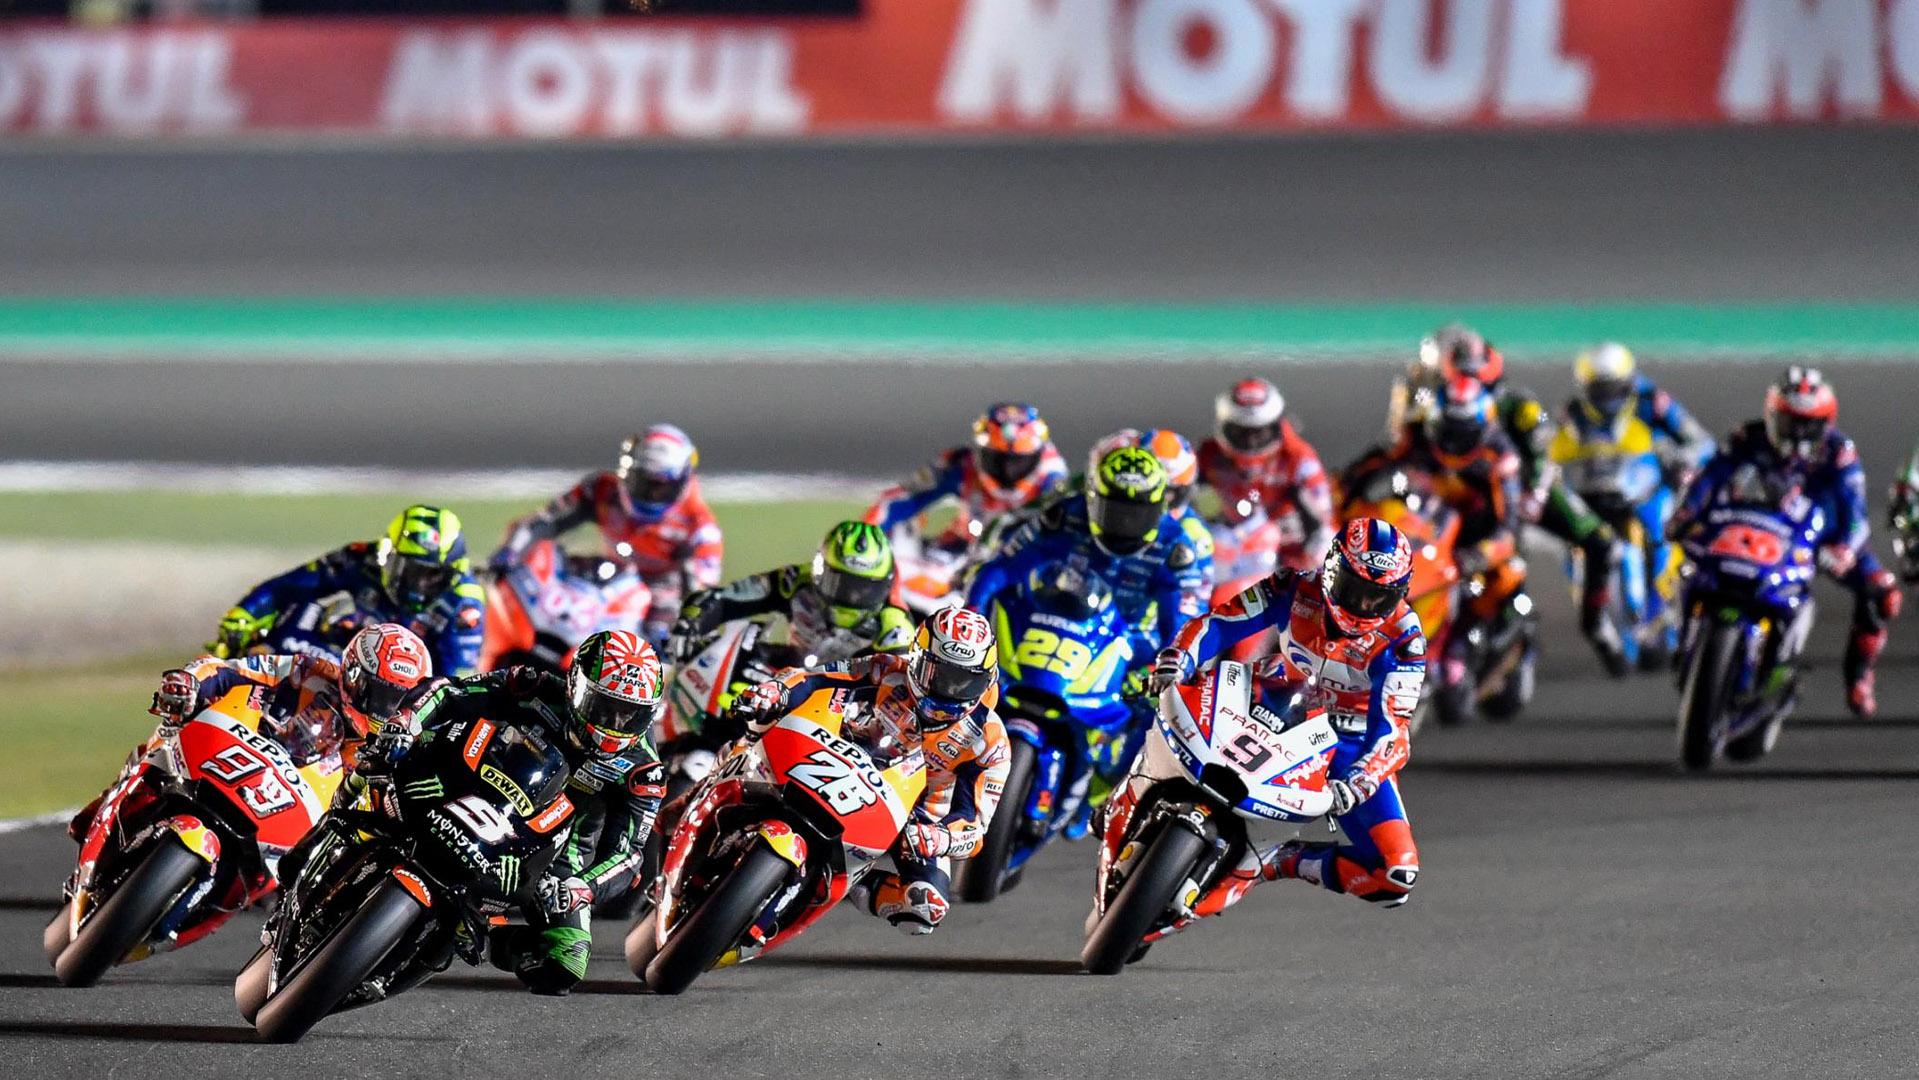 MotoGP Screening | Malaysian Grand Prix